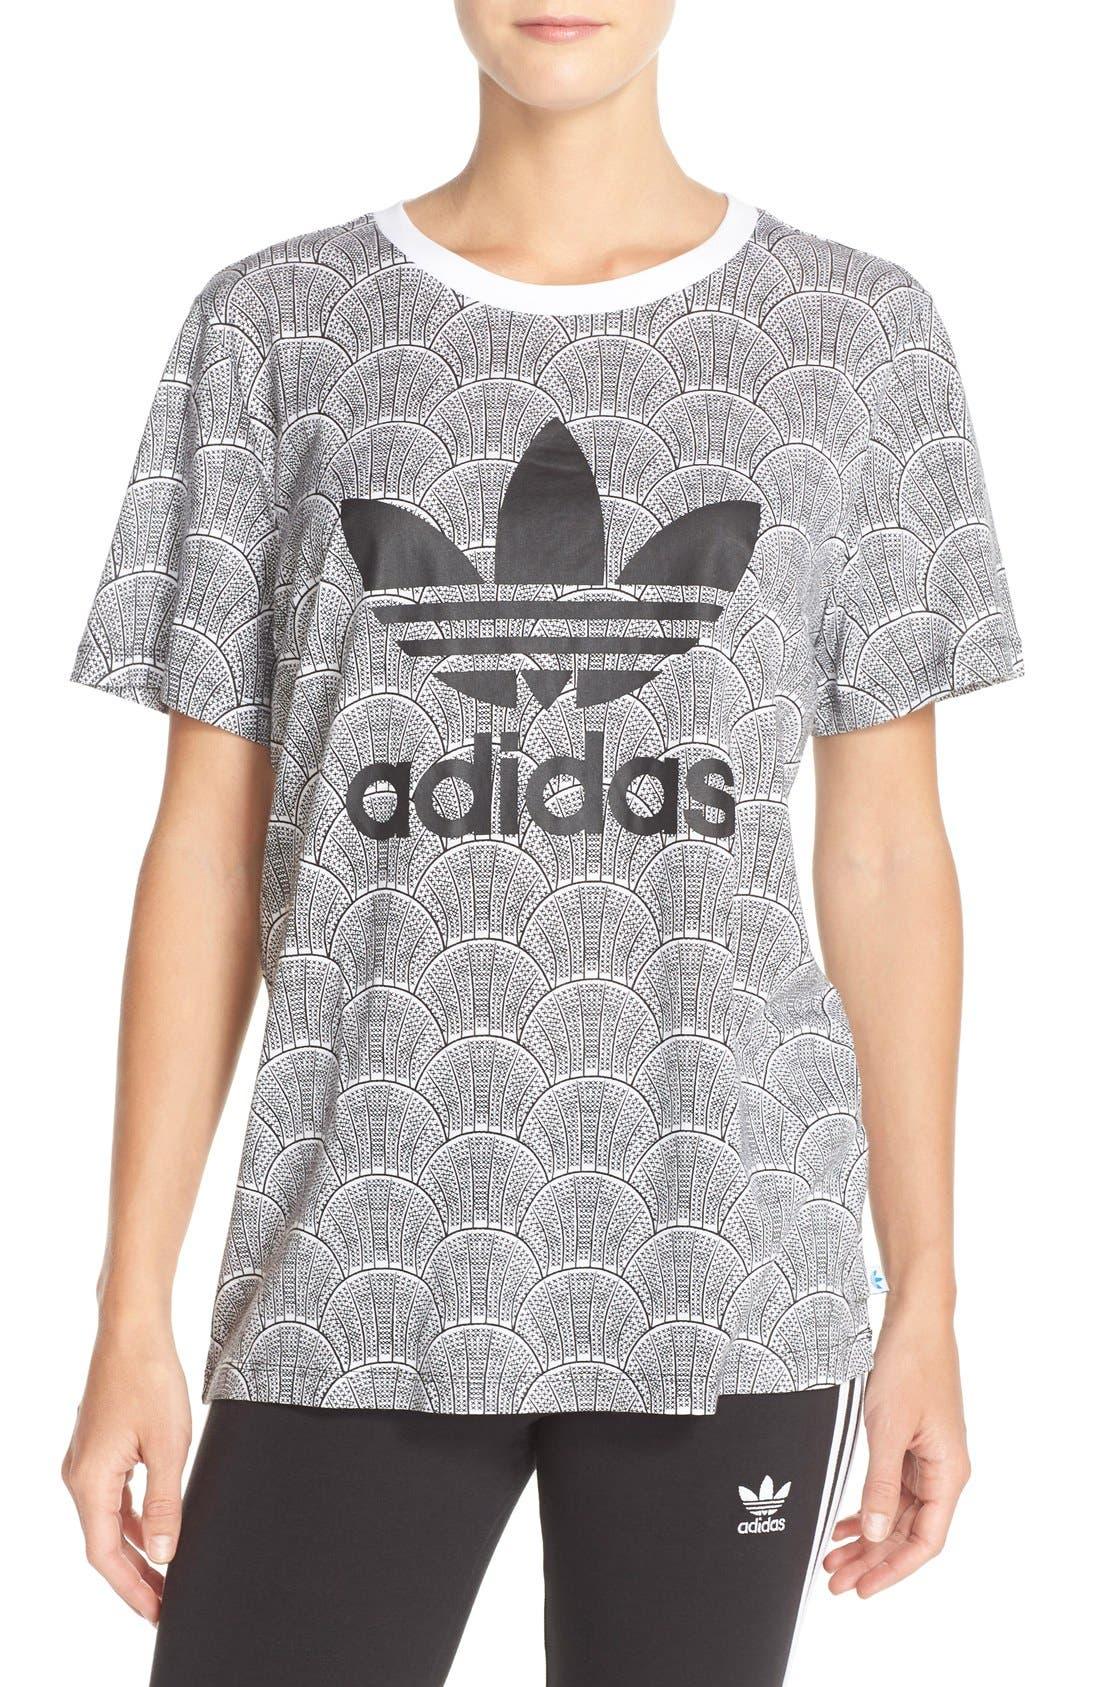 Main Image - adidas Originals 'Shell Tile' Boyfriend Tee